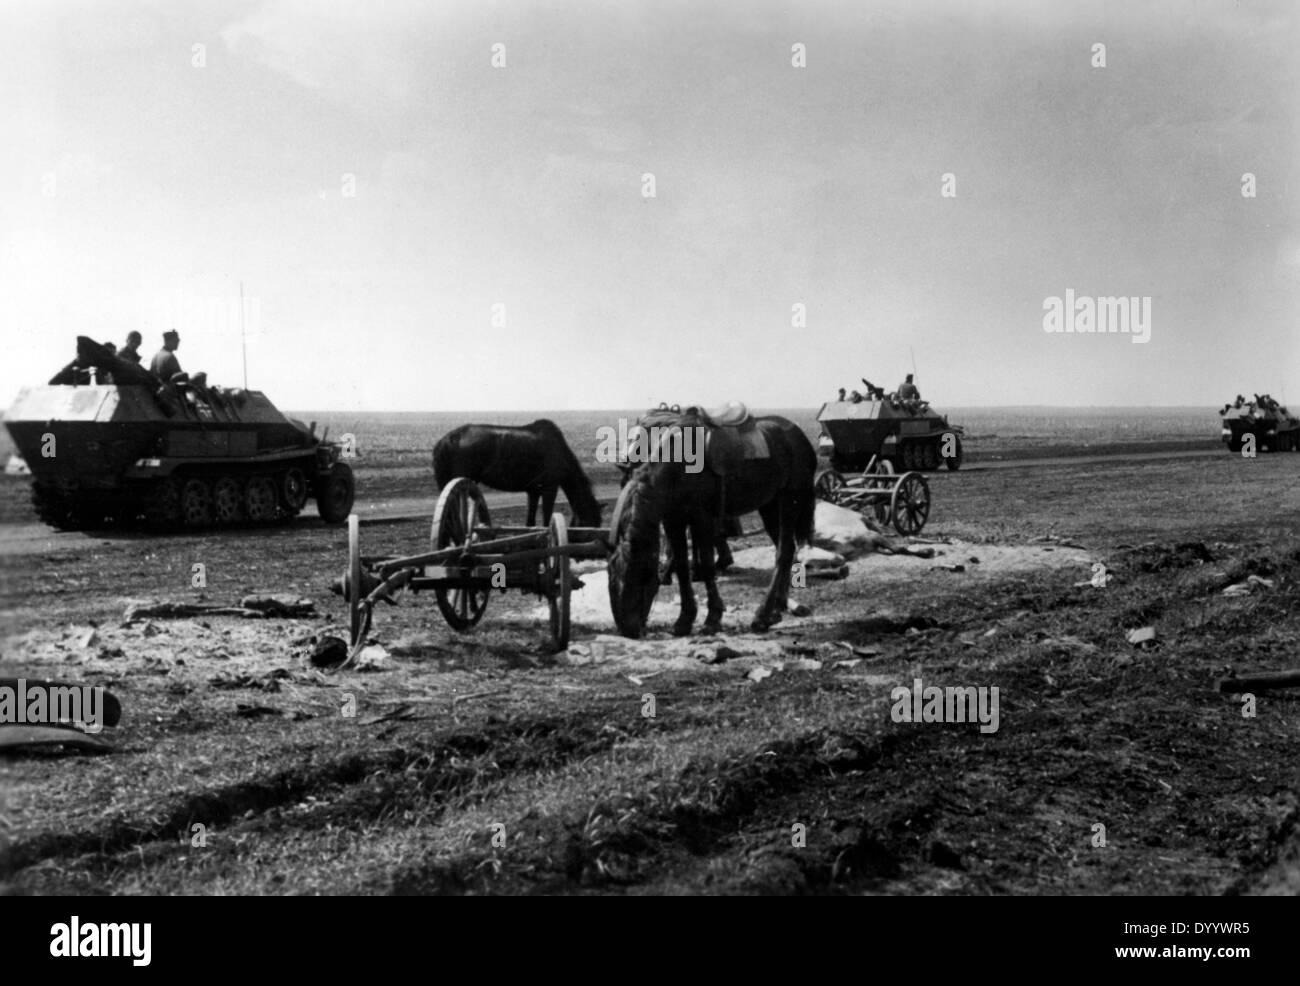 World War II: The Battle of Kharkov-Izyum, May 1942 - Stock Image